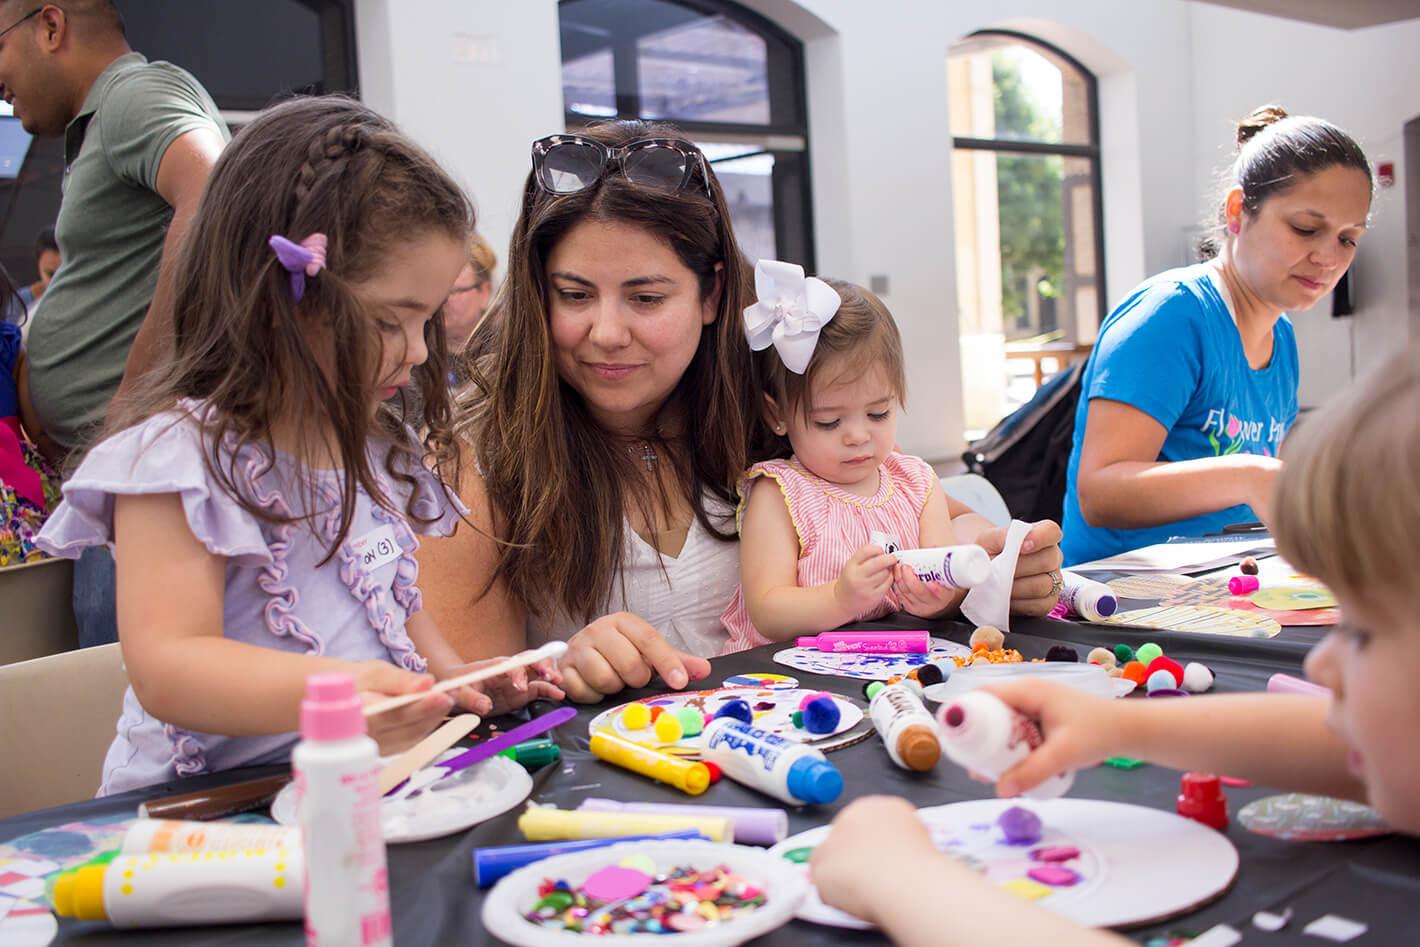 caregiver helping children make art